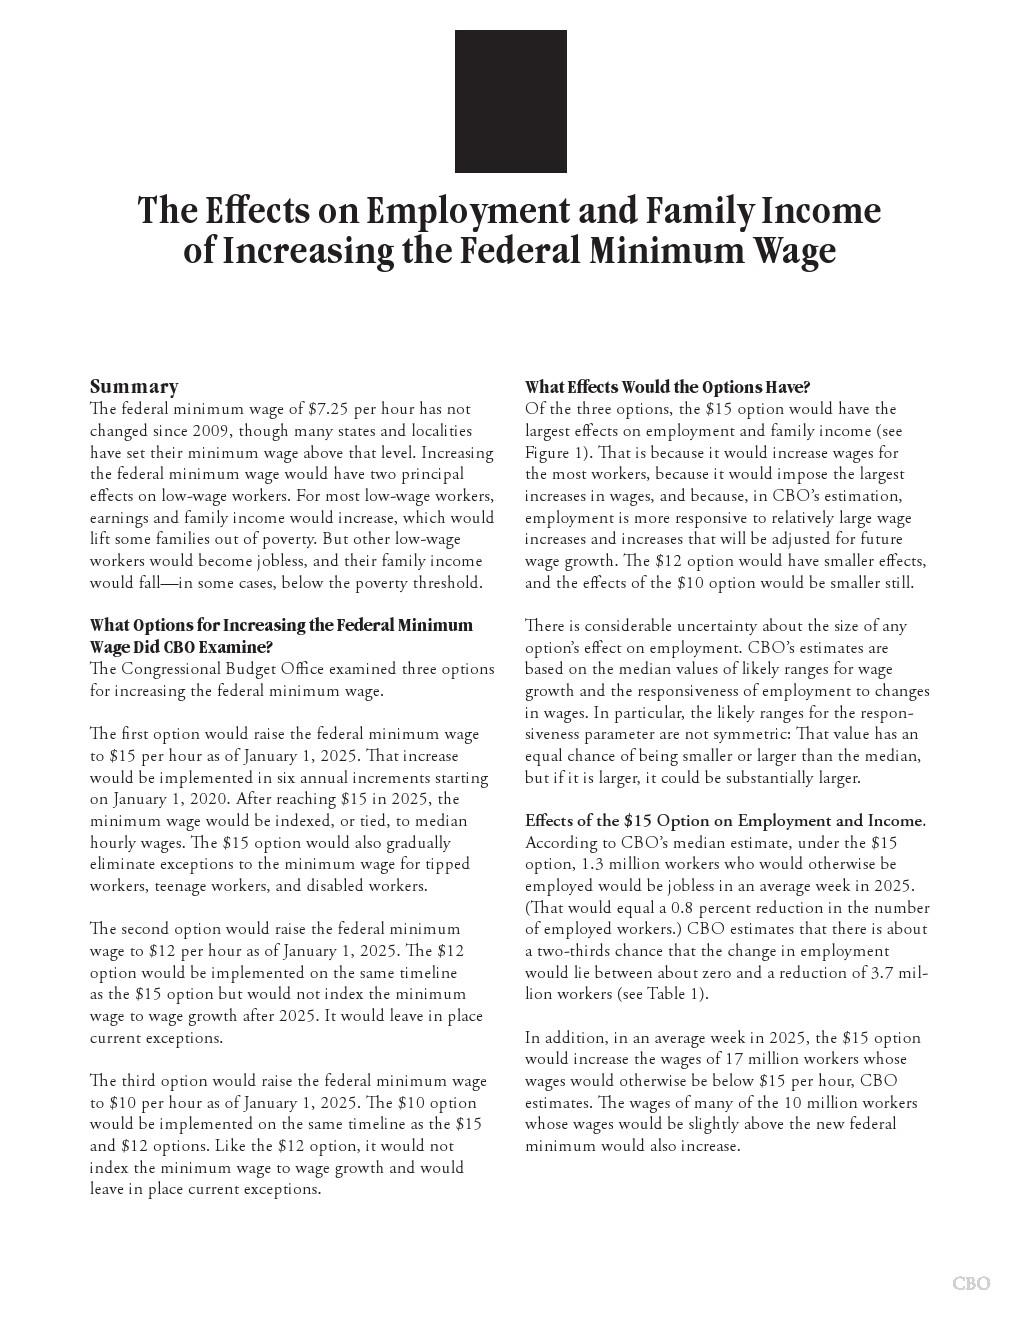 CBO:2018年美国最低工资增长调查报告